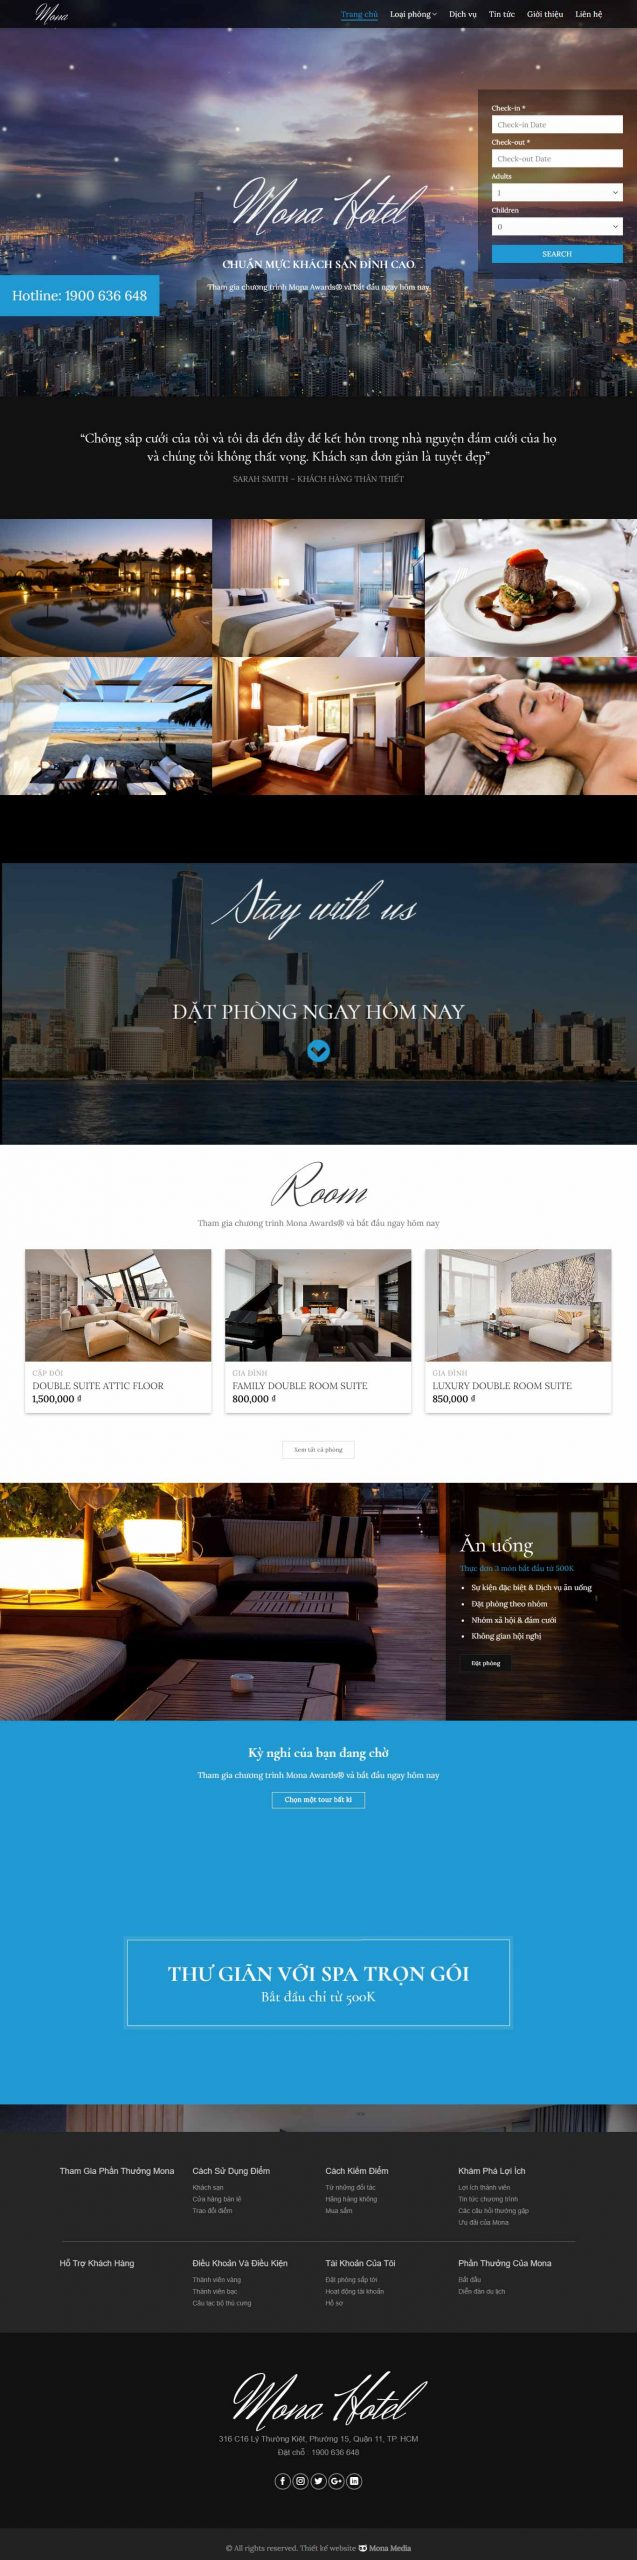 Mẫu Website giới thiệu Khách Sạn Encore